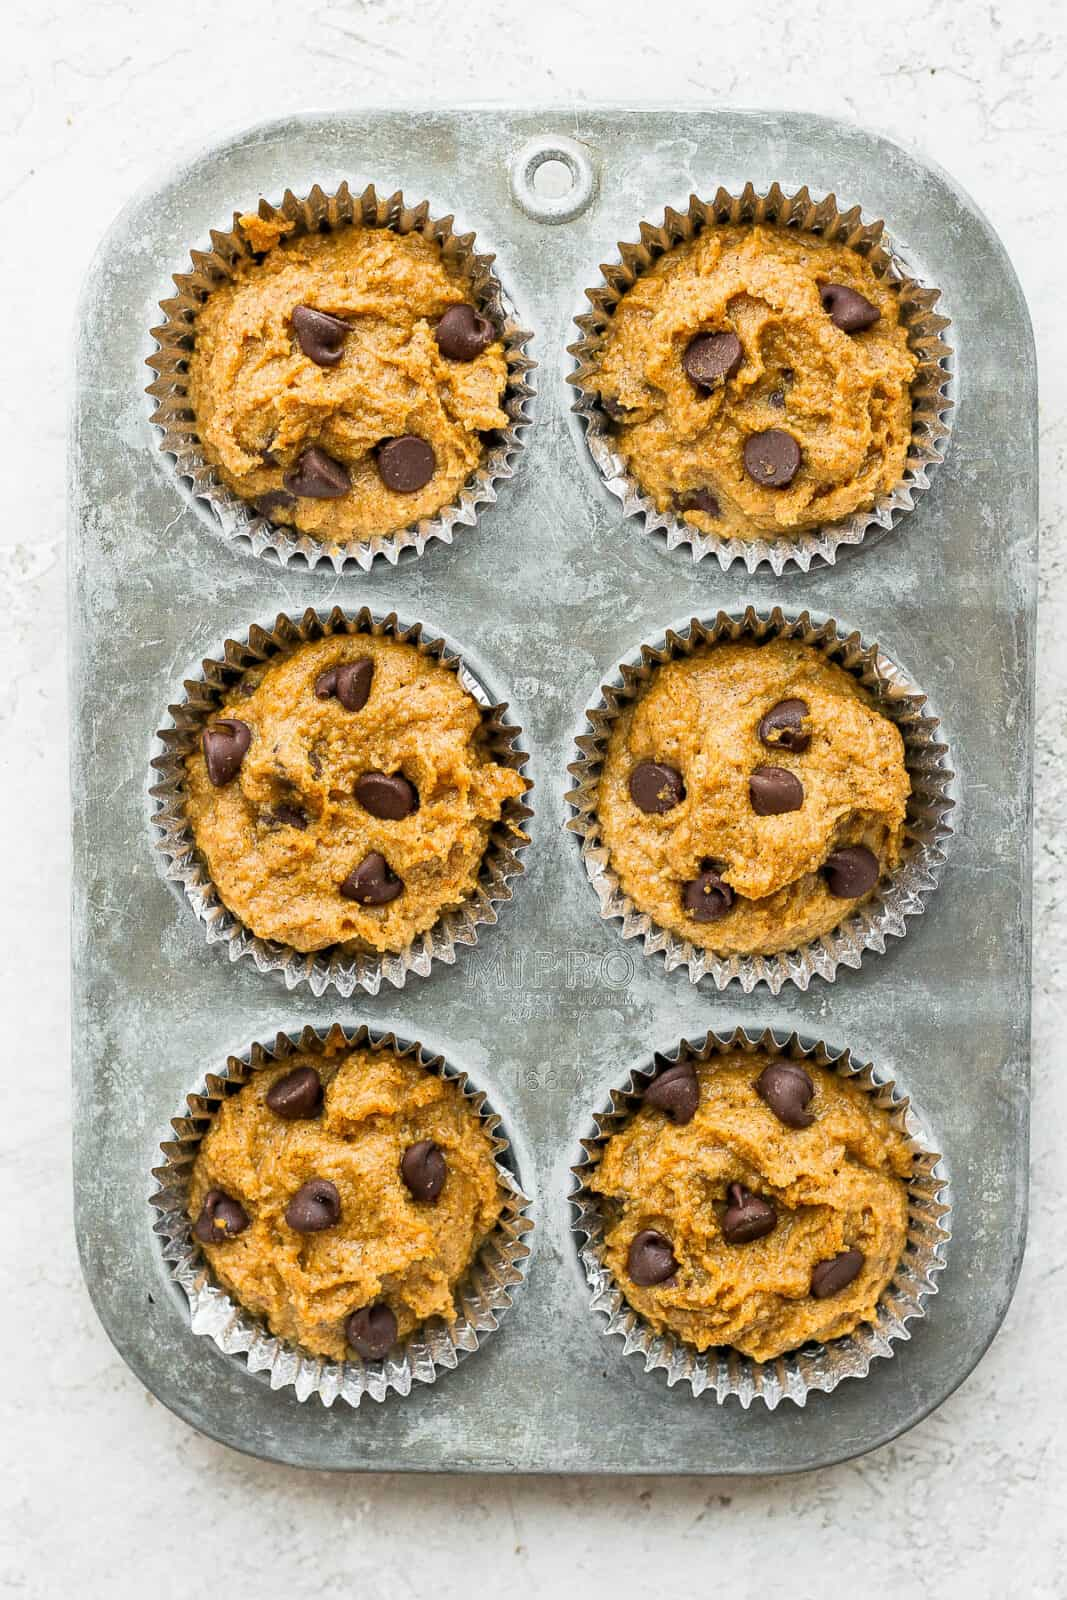 Pumpkin muffins batter in a muffin tin before baking.